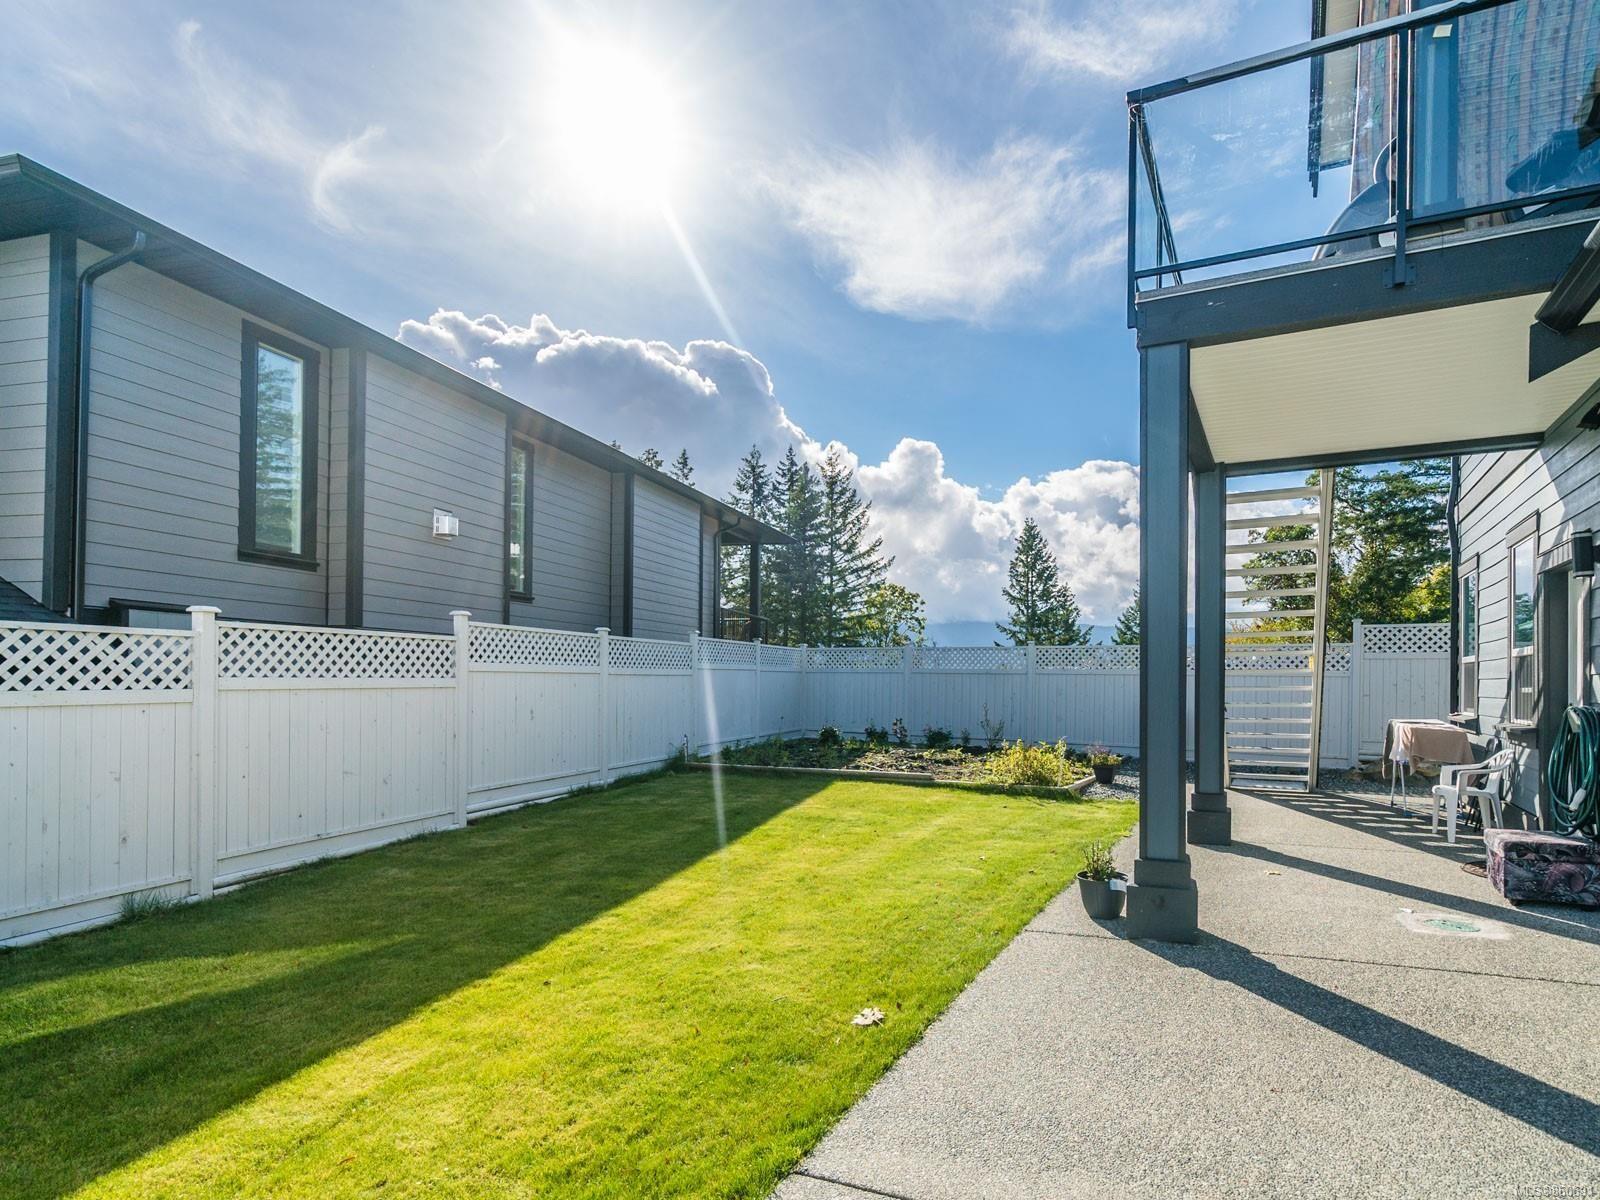 Photo 55: Photos: 5821 Linley Valley Dr in : Na North Nanaimo House for sale (Nanaimo)  : MLS®# 860691